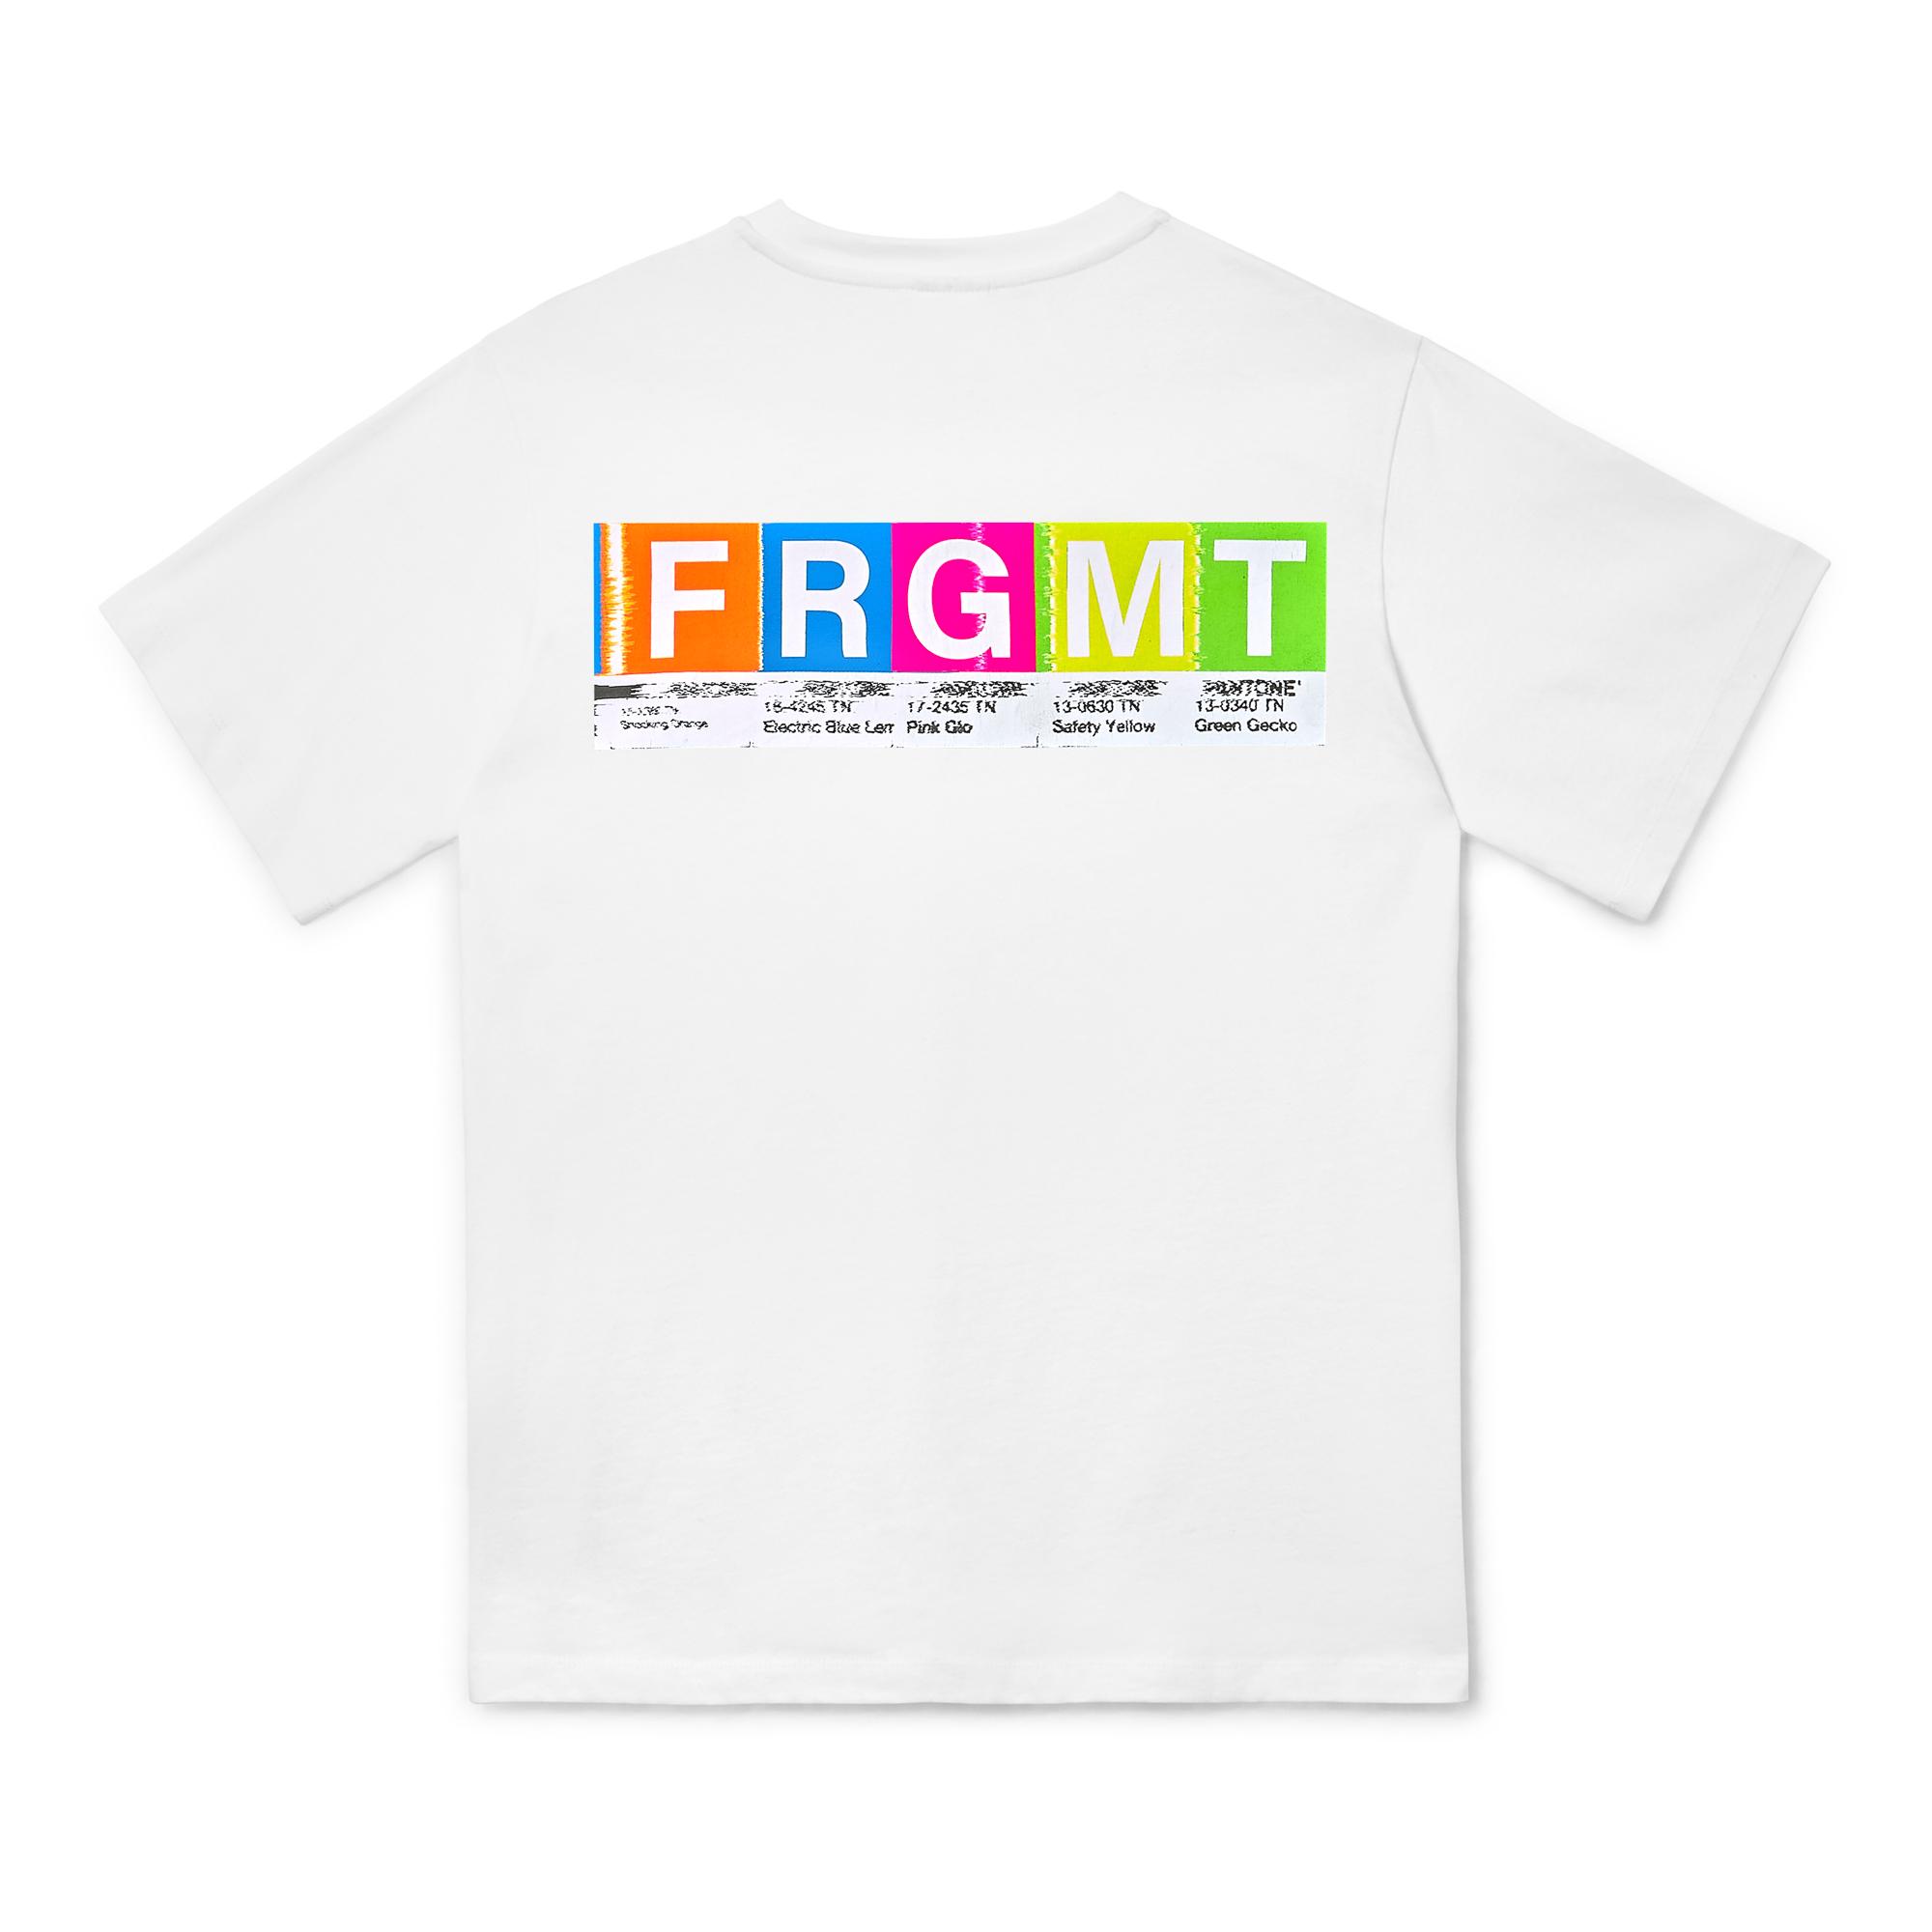 FRAGMENT - shot 9